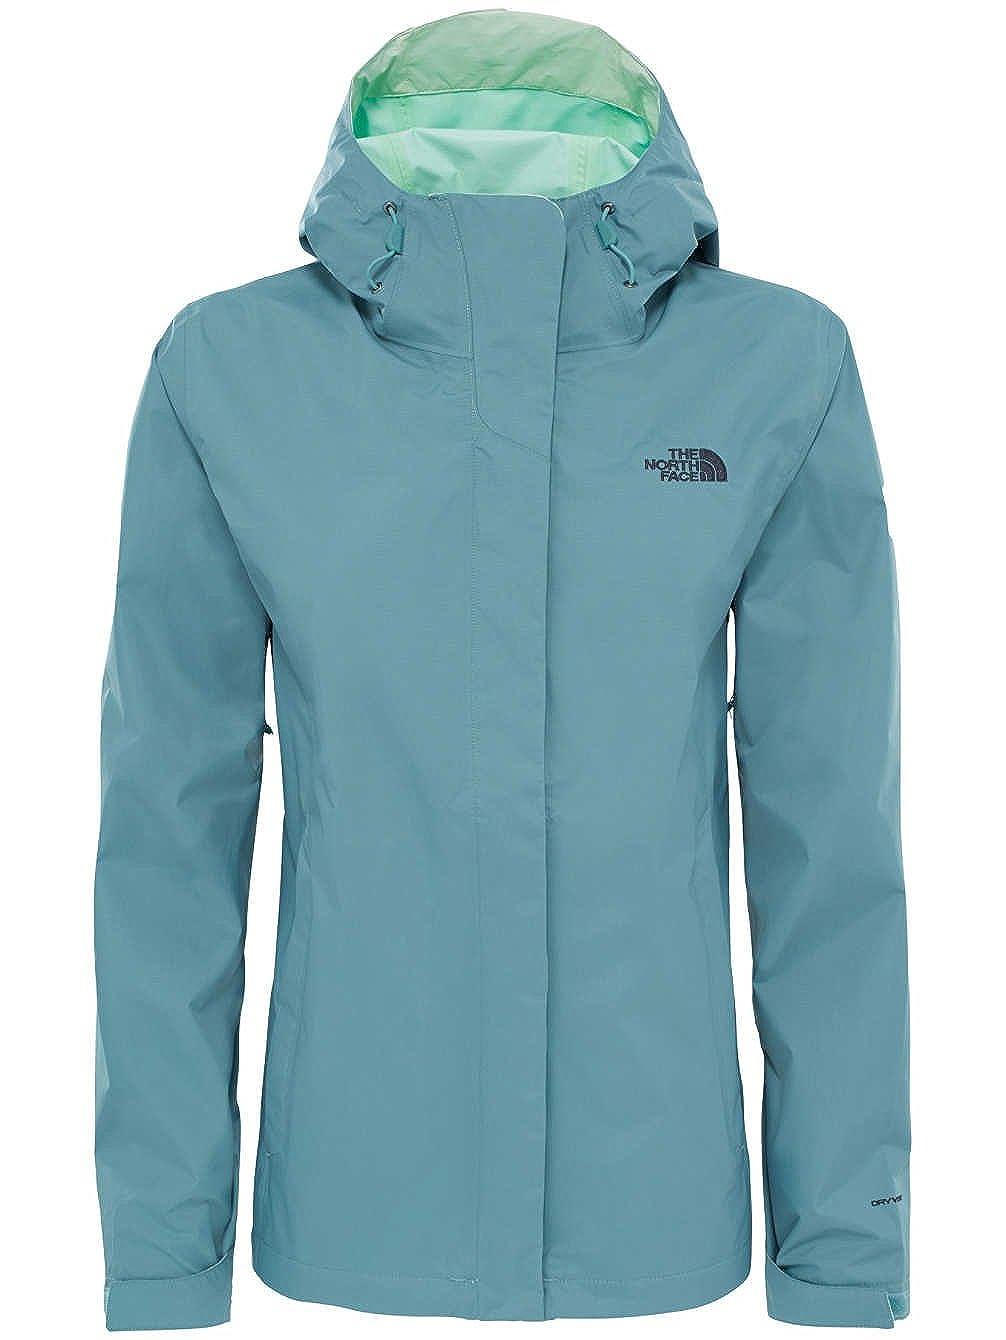 1e33c18d2 The North Face Venture 2 Jacket - Women's Trellis Green, XL